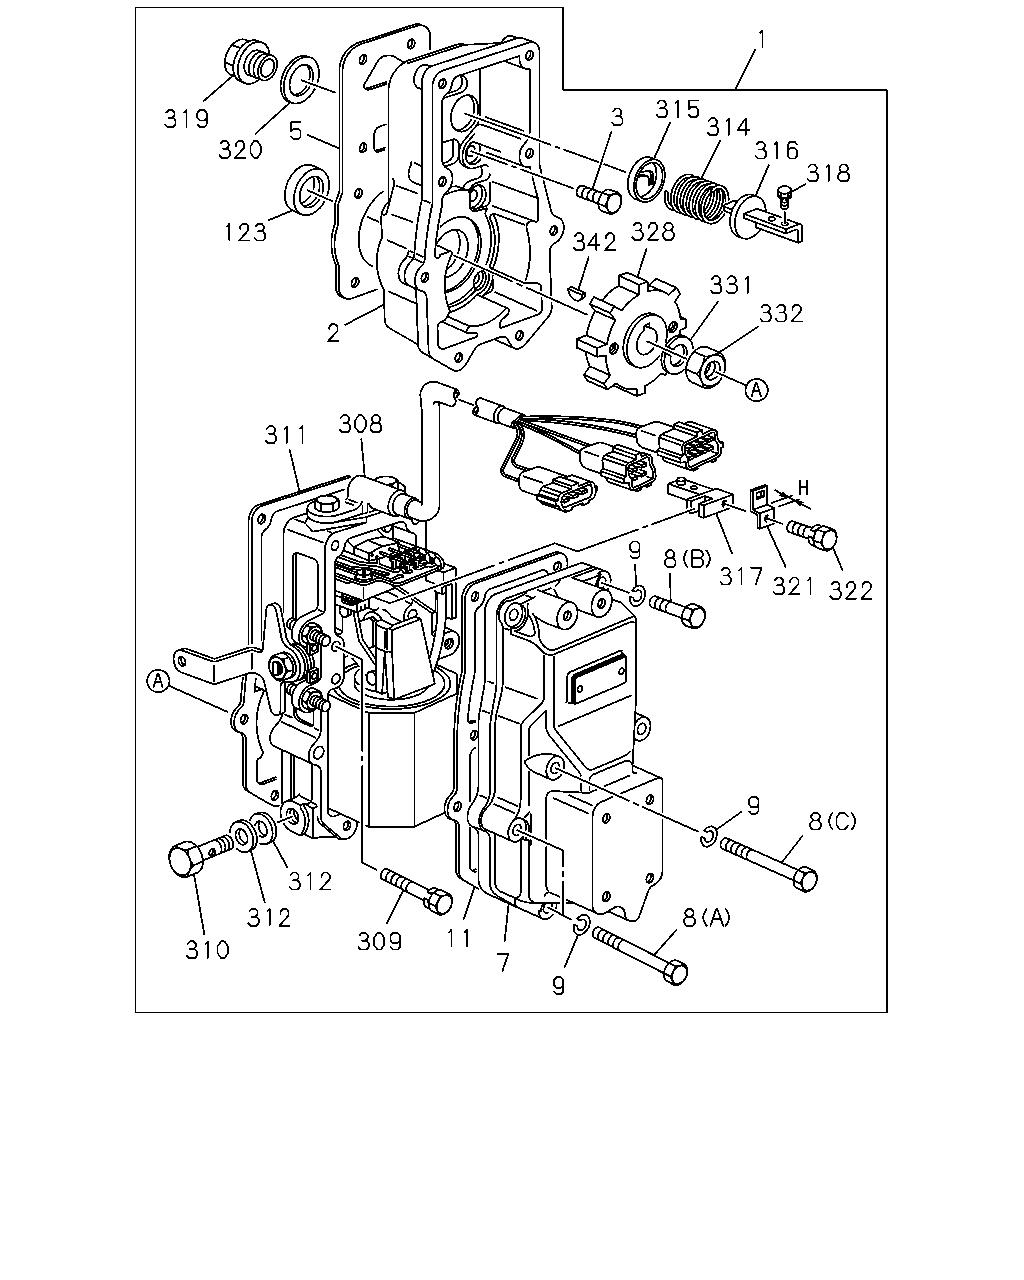 Ce 10806 Exz Rhd Fuel Tank 400l 99 00 0 Engine Emission Electronic Governor Circuit Diagram Parts